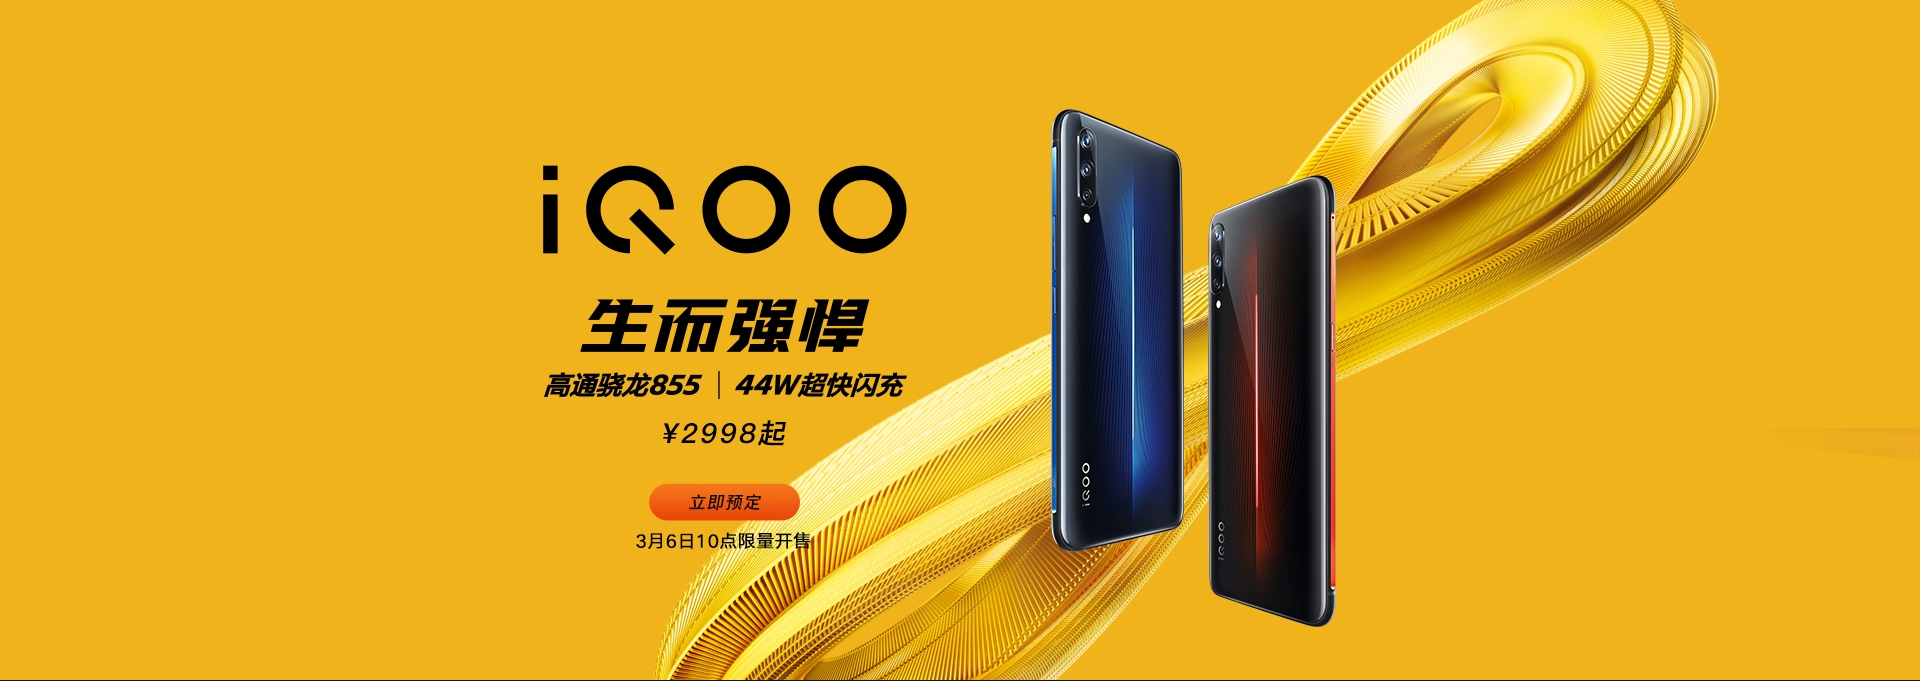 "Vivo iQOO je nový ""turbo"" smartphone pro hráče"